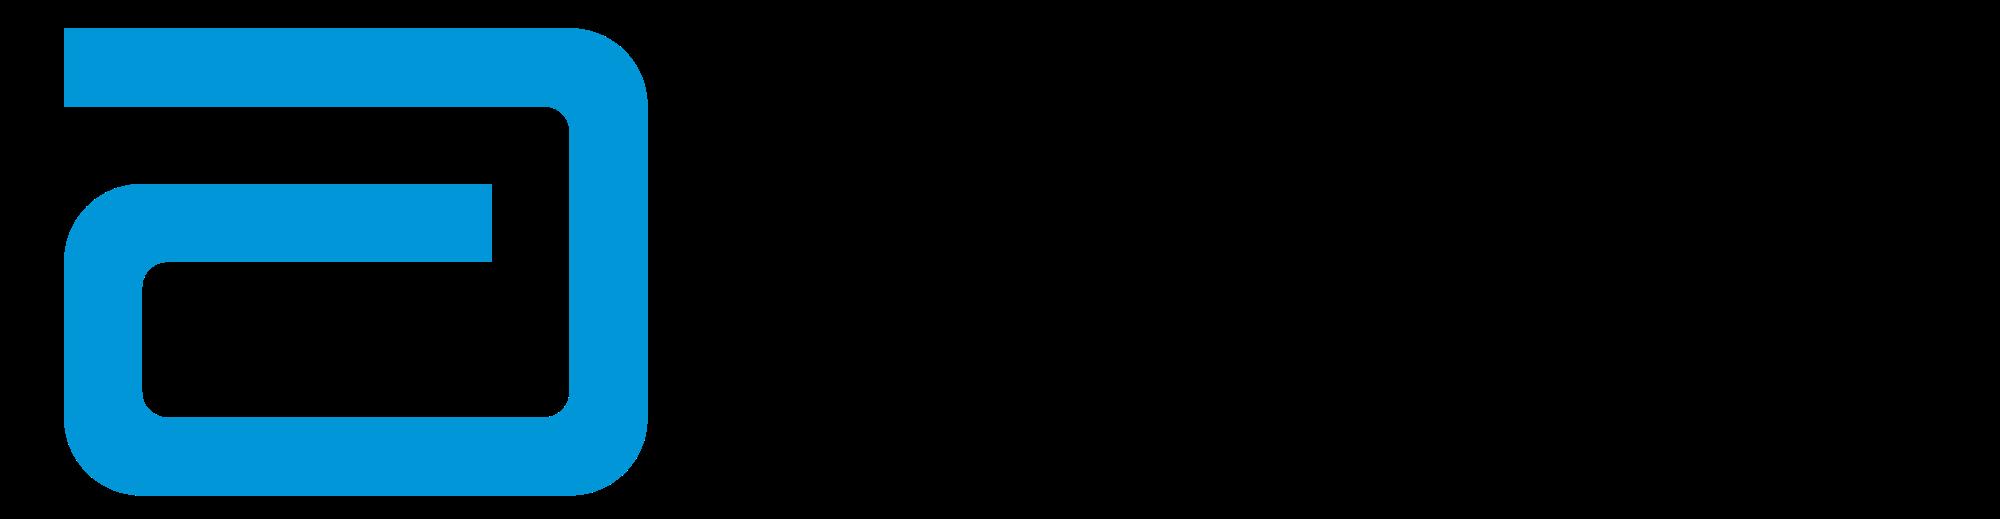 Open PlusPng.com  - Abbot Laboratories PNG